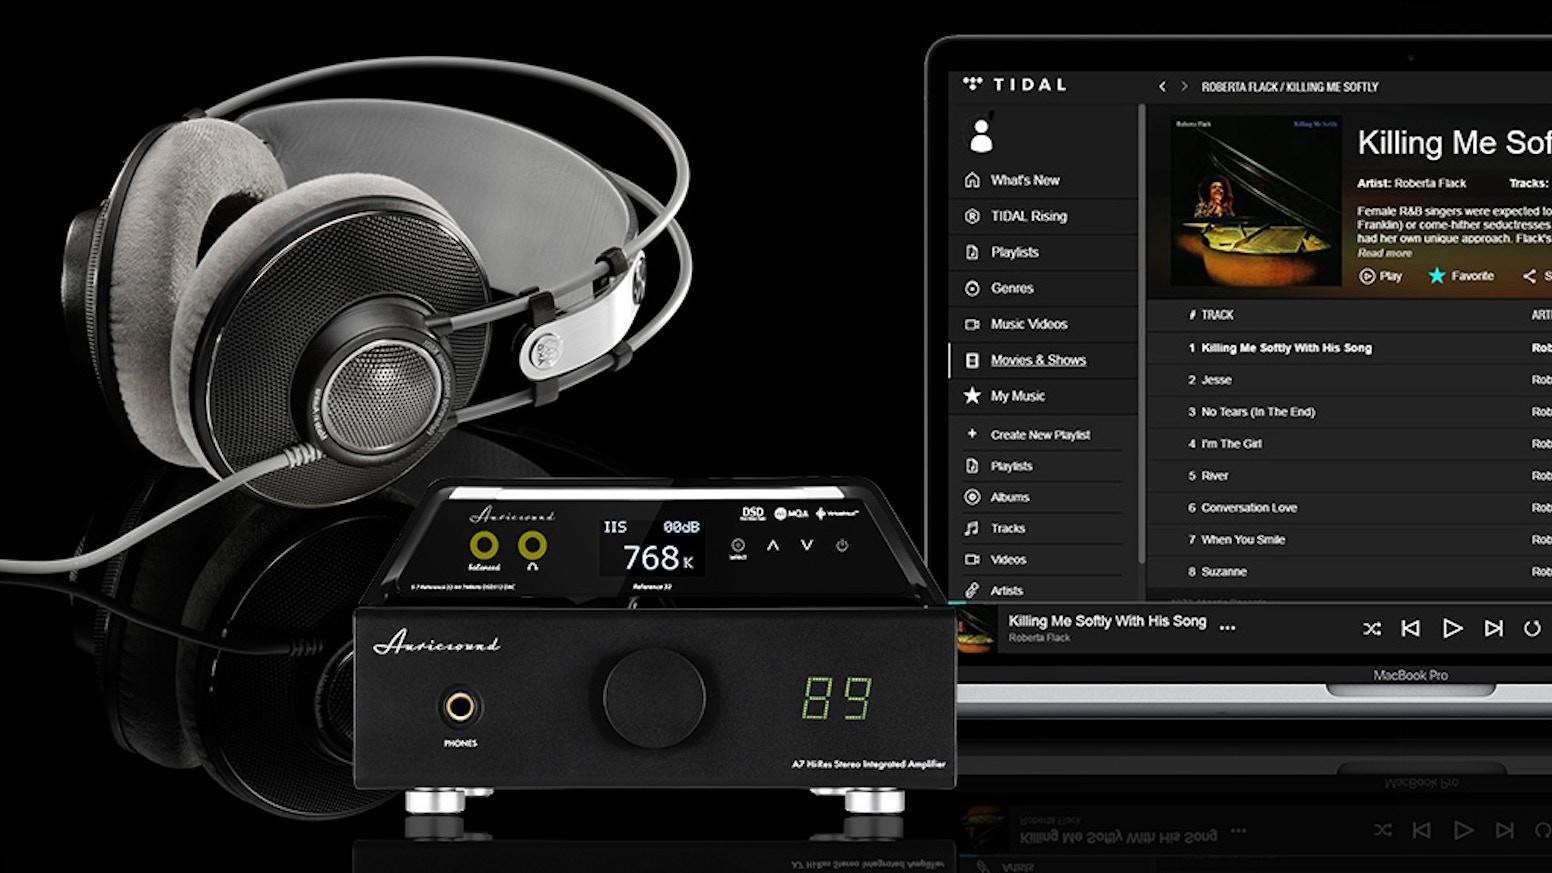 AuricSound A7 Vacuum Tube Amp XLR Stereo Systems | Stereo Hybrid | Warm & Rich Sound | XLR Hi-Res System | Hi-Fi Monitor Speakers AMP